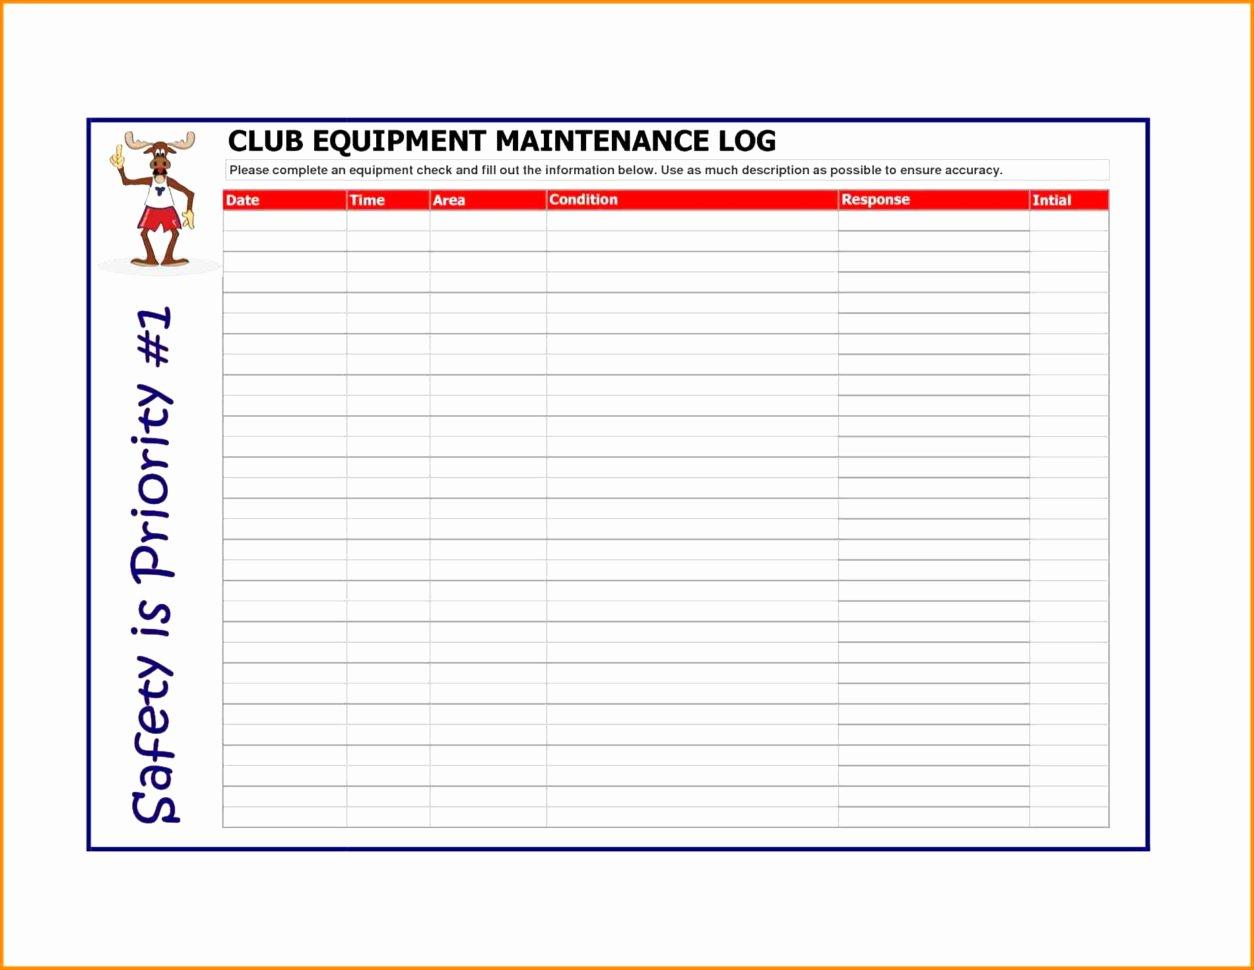 Equipment Maintenance Log Template Excel Luxury Equipment Maintenance Spreadsheet Spreadsheet Downloa